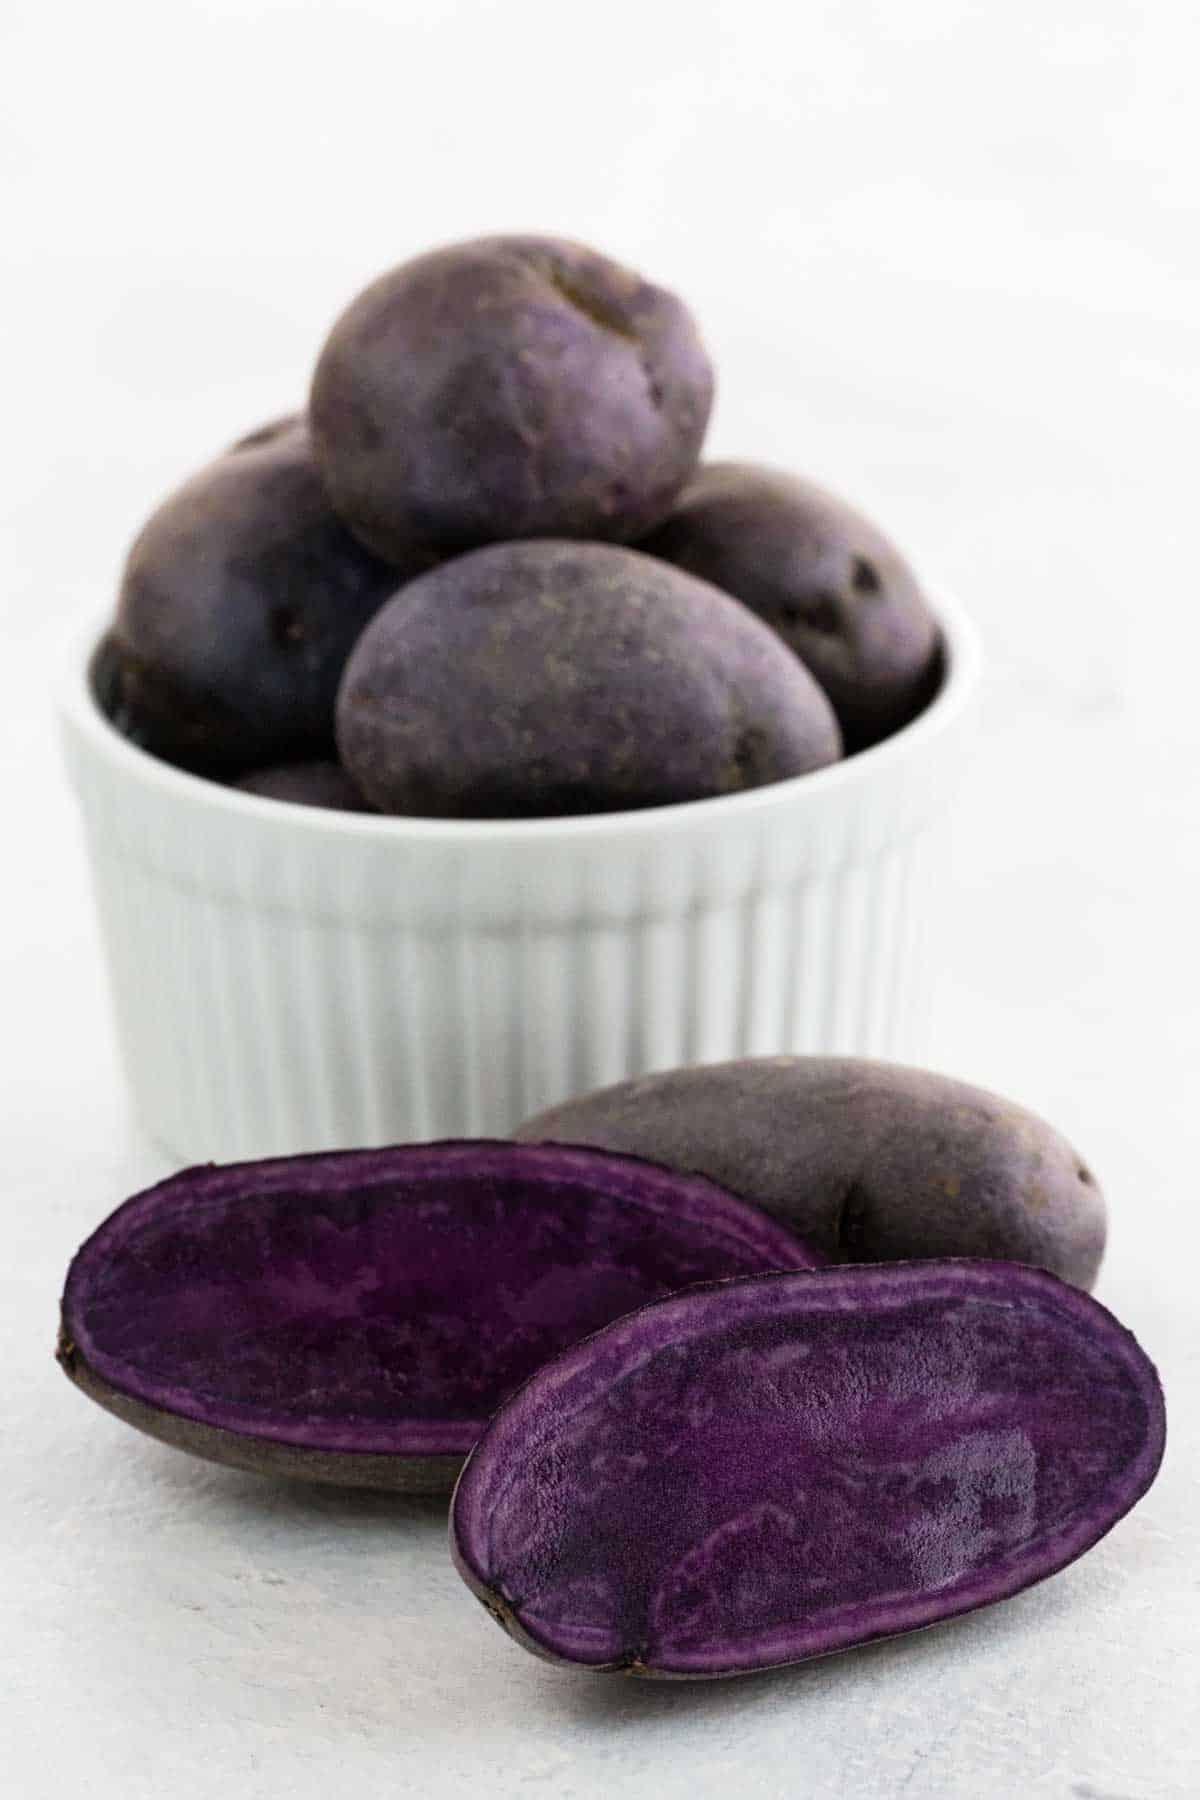 Purple Potatoes (All-Purpose)